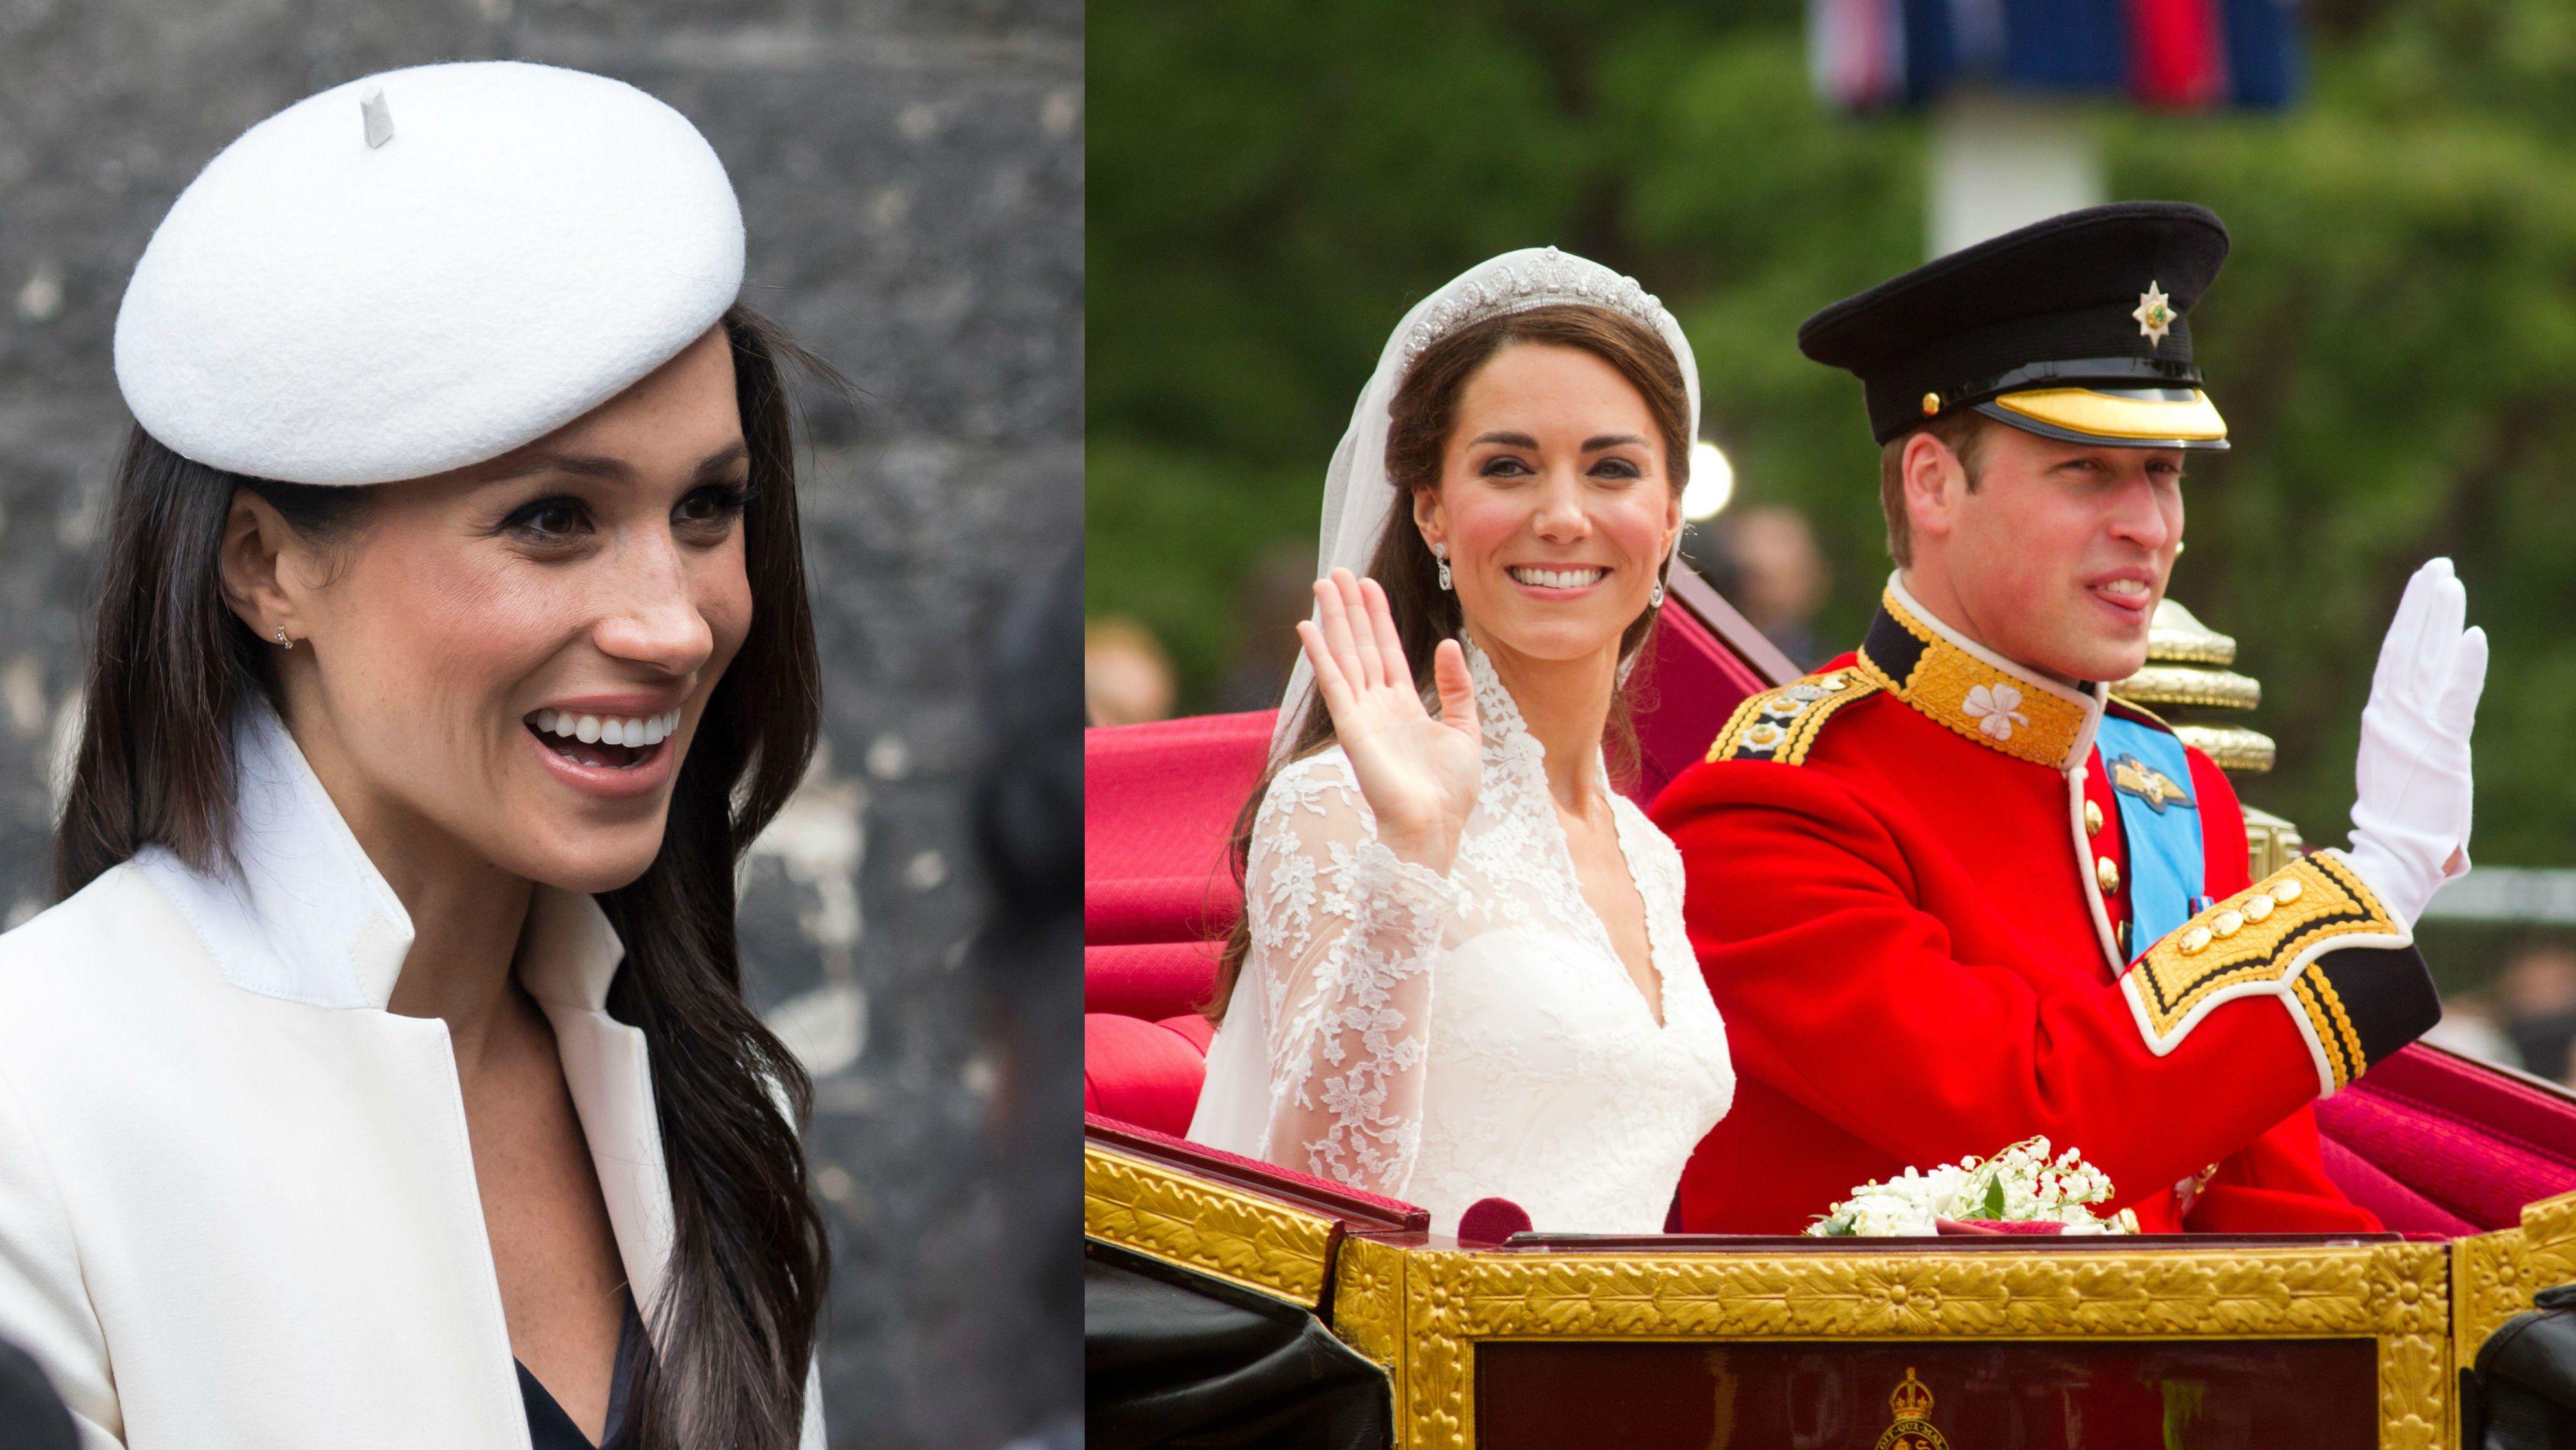 Meghan Markle Wont Wear Kate Middletons Wedding Tiara for an Obvious Reason forecast